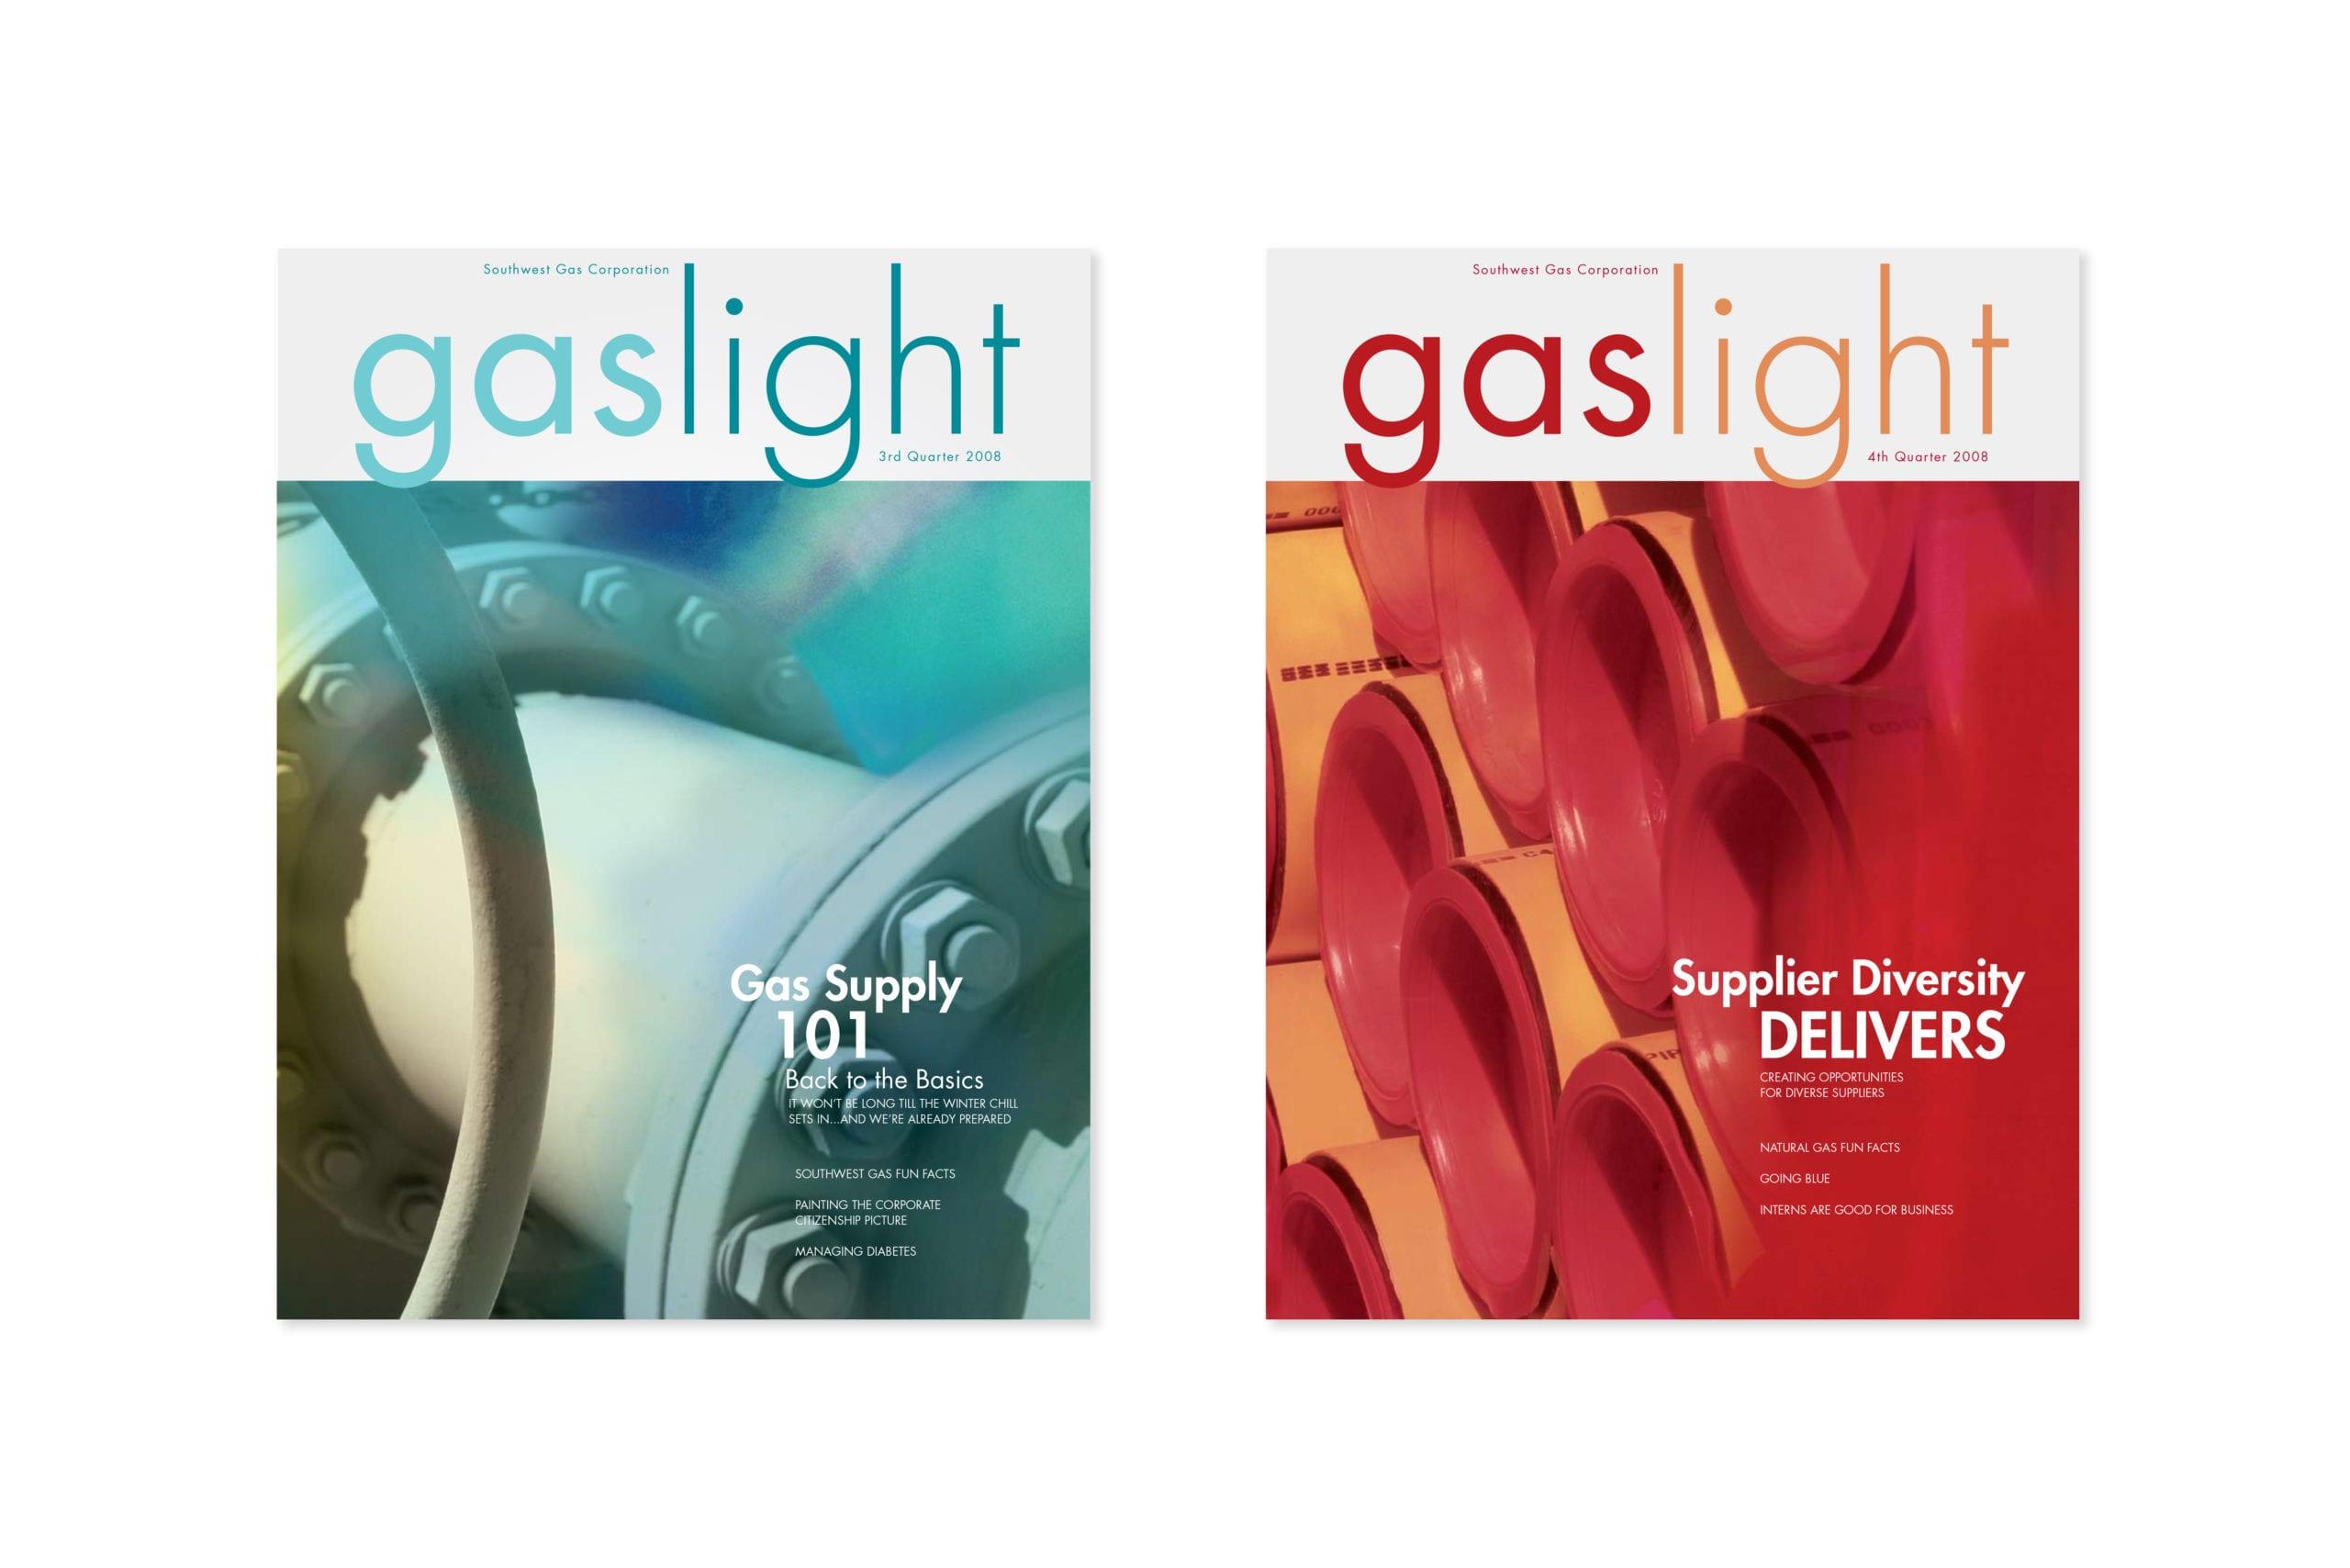 "Southwest Gas, ""Gaslight"" magazine covers, designed by Canyon Creative."